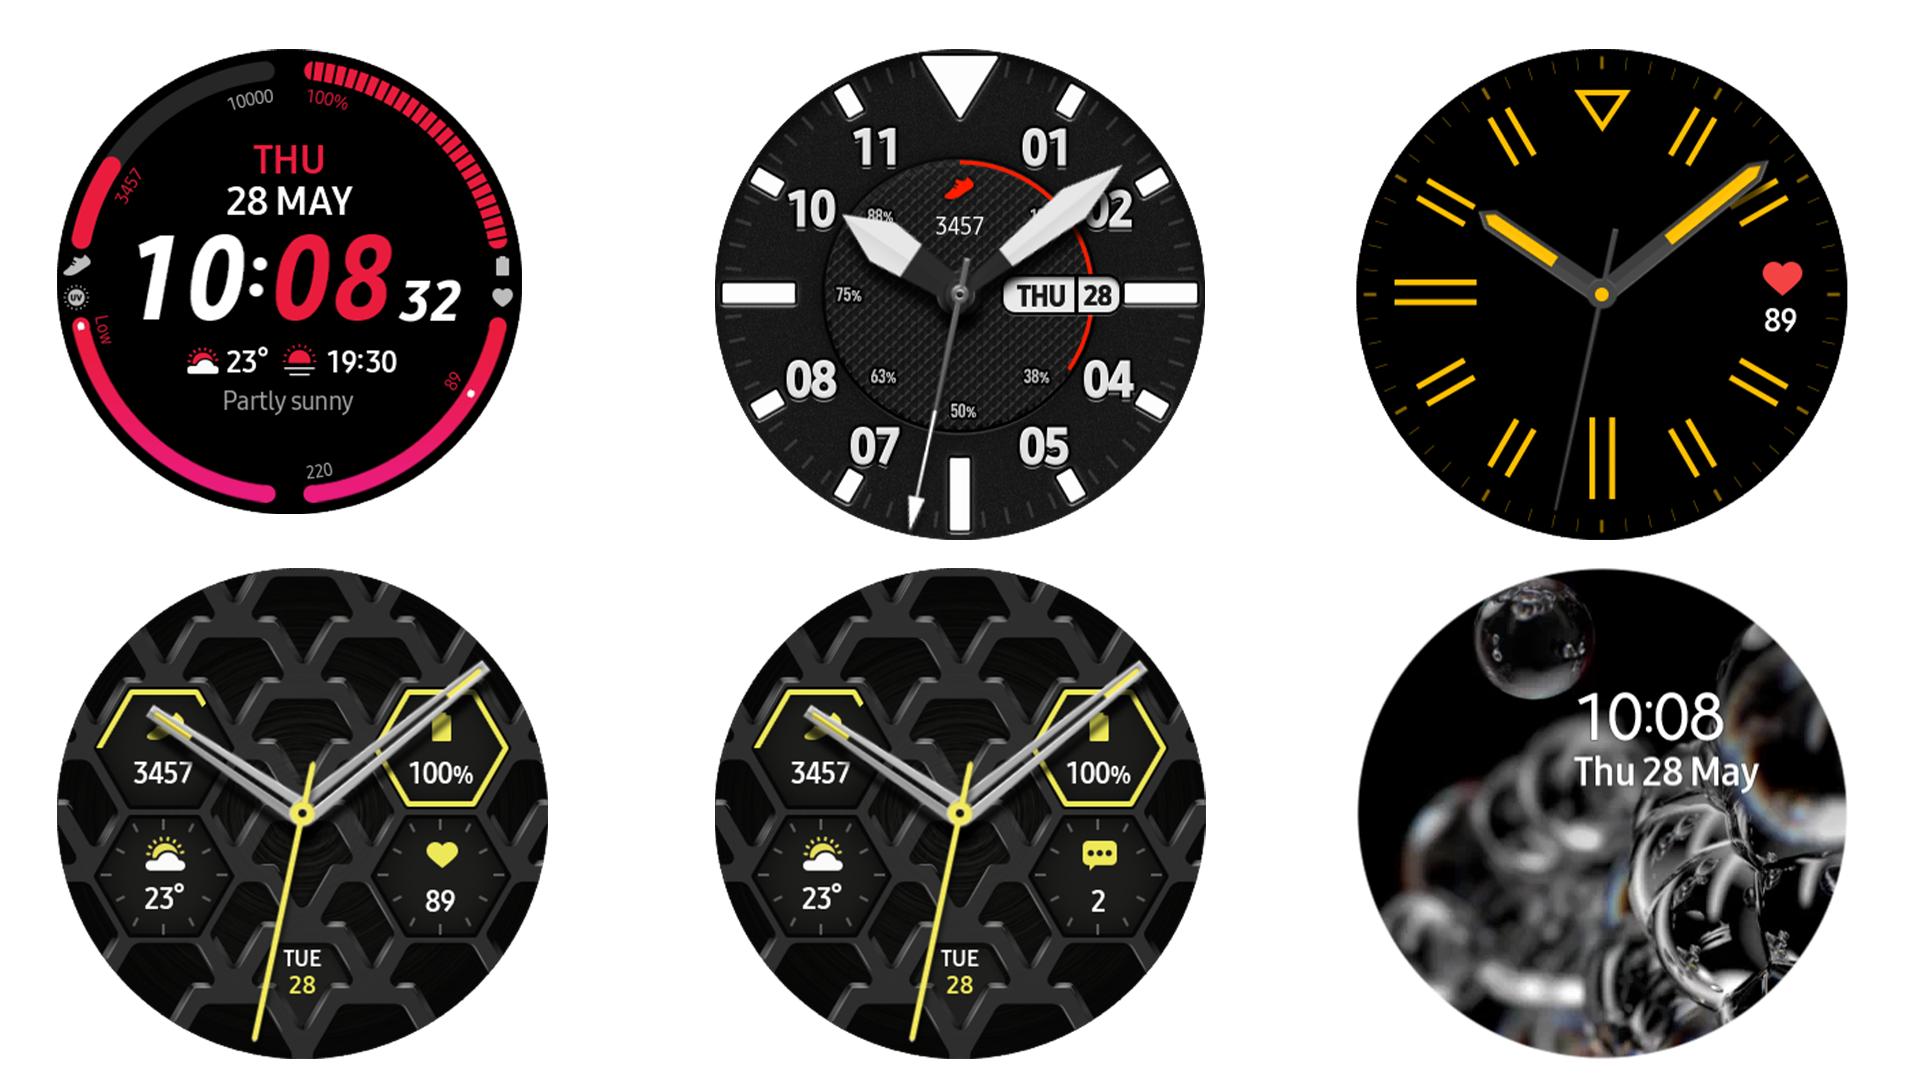 Samsung Galaxy Watch 3 Watch Faces